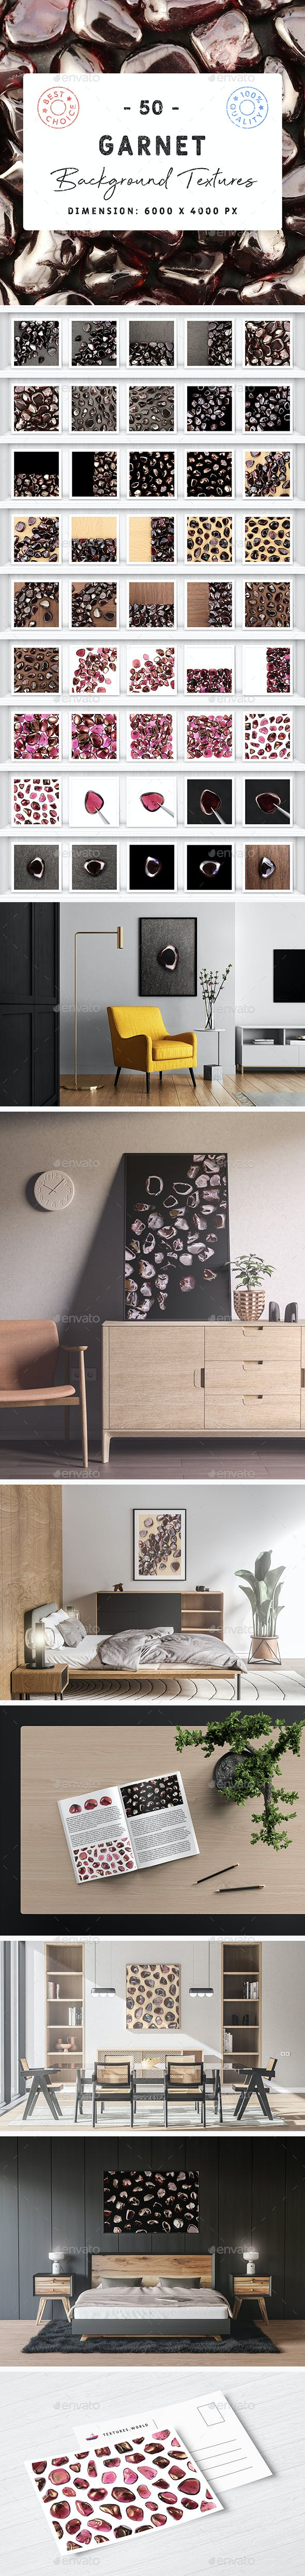 50 Garnet Background Textures - 3DOcean Item for Sale